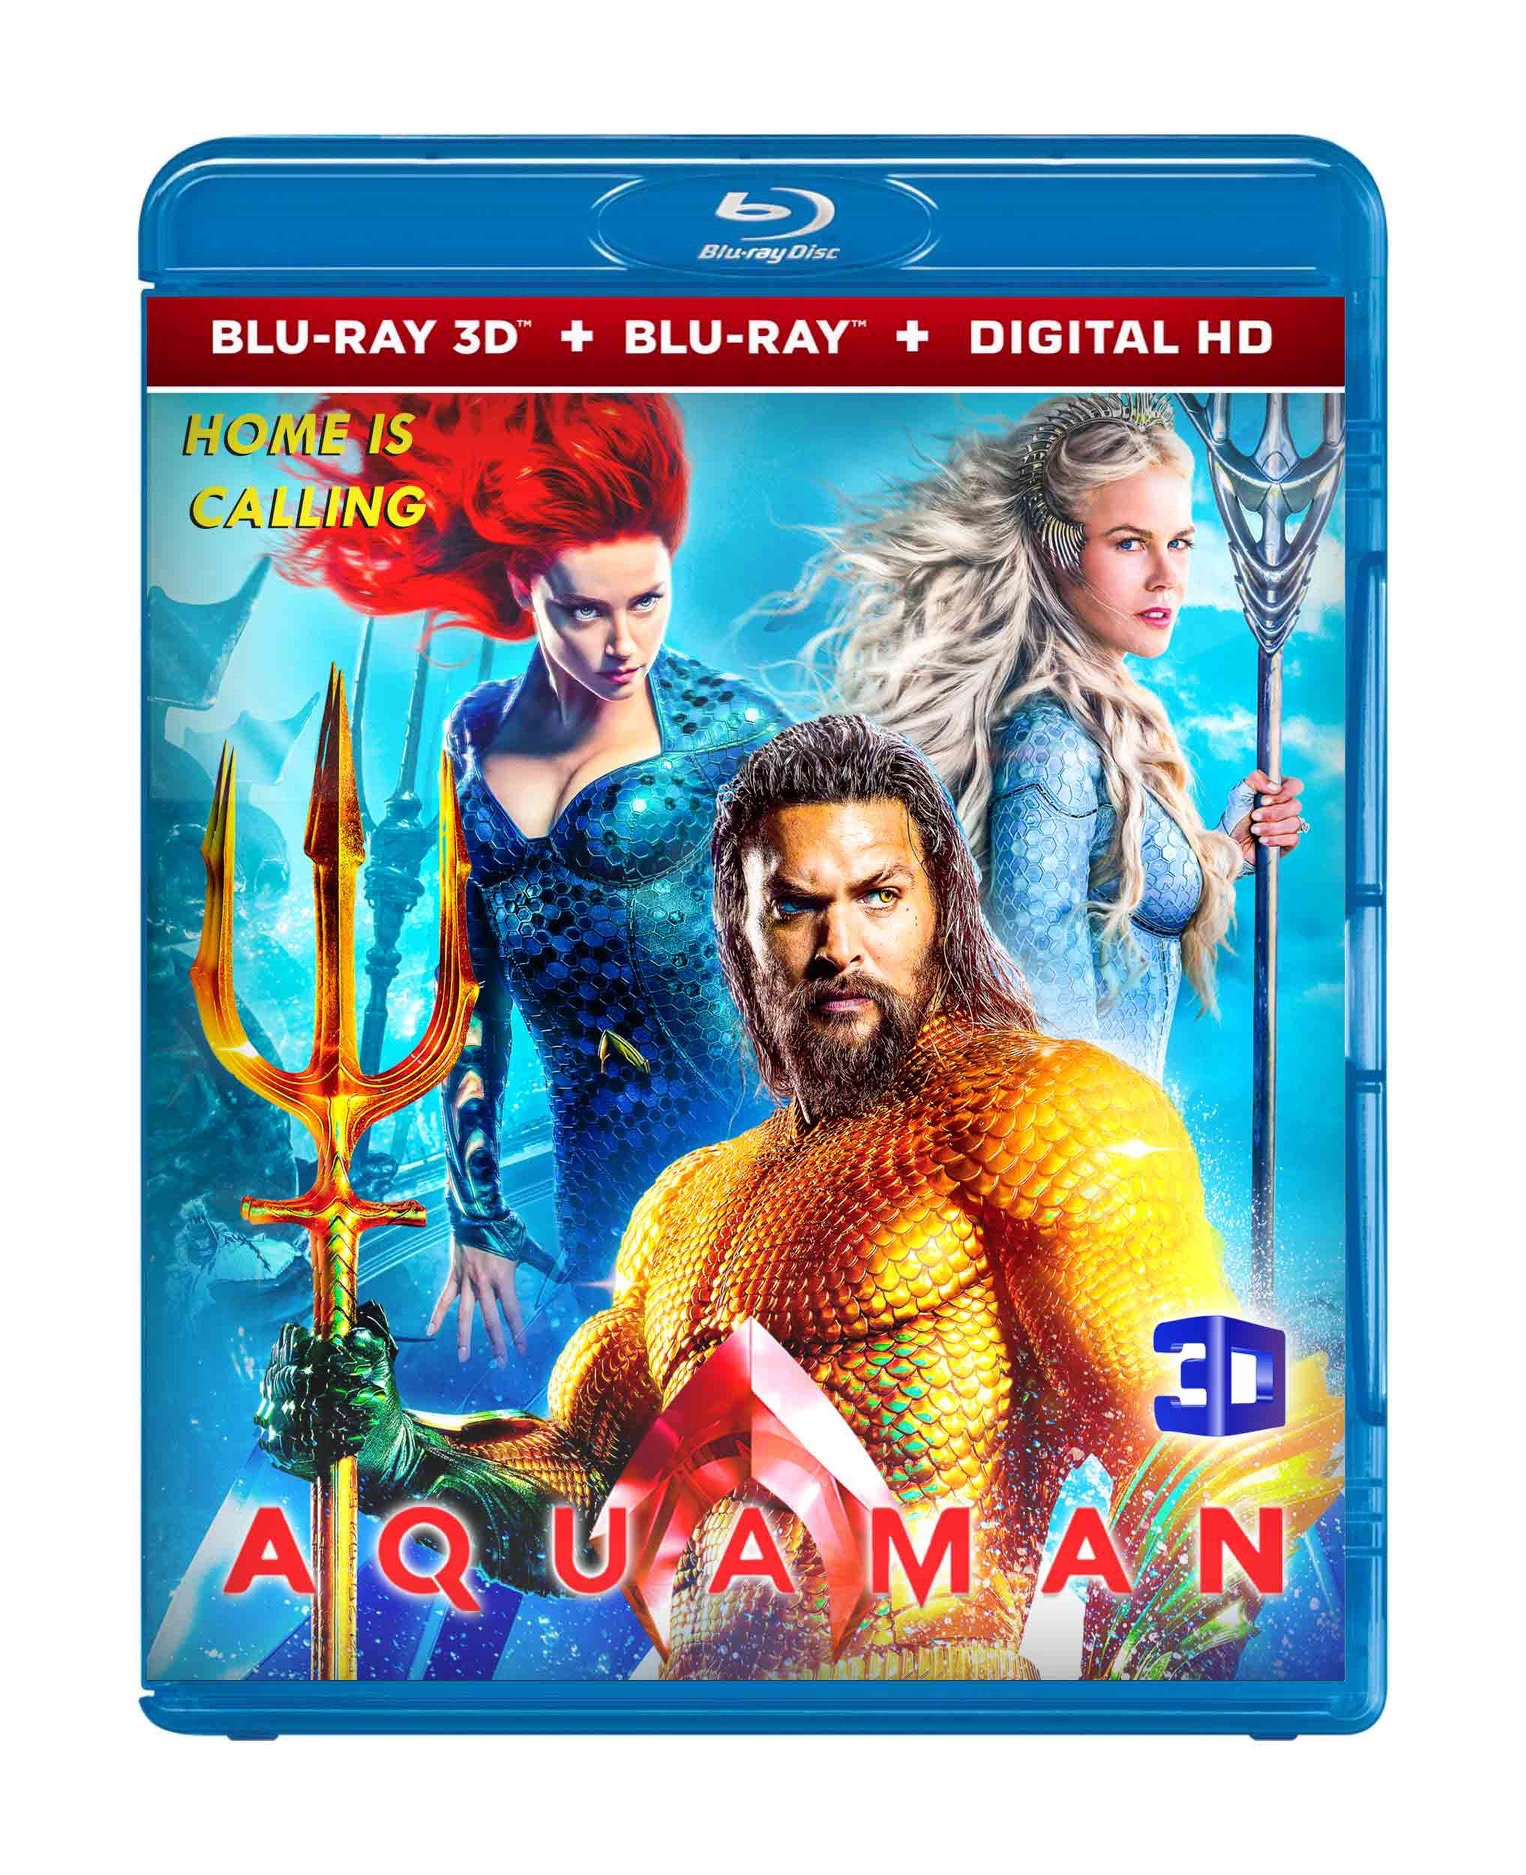 Aquaman(3D) 2019 bluray Summer sale Hot Deal Region free